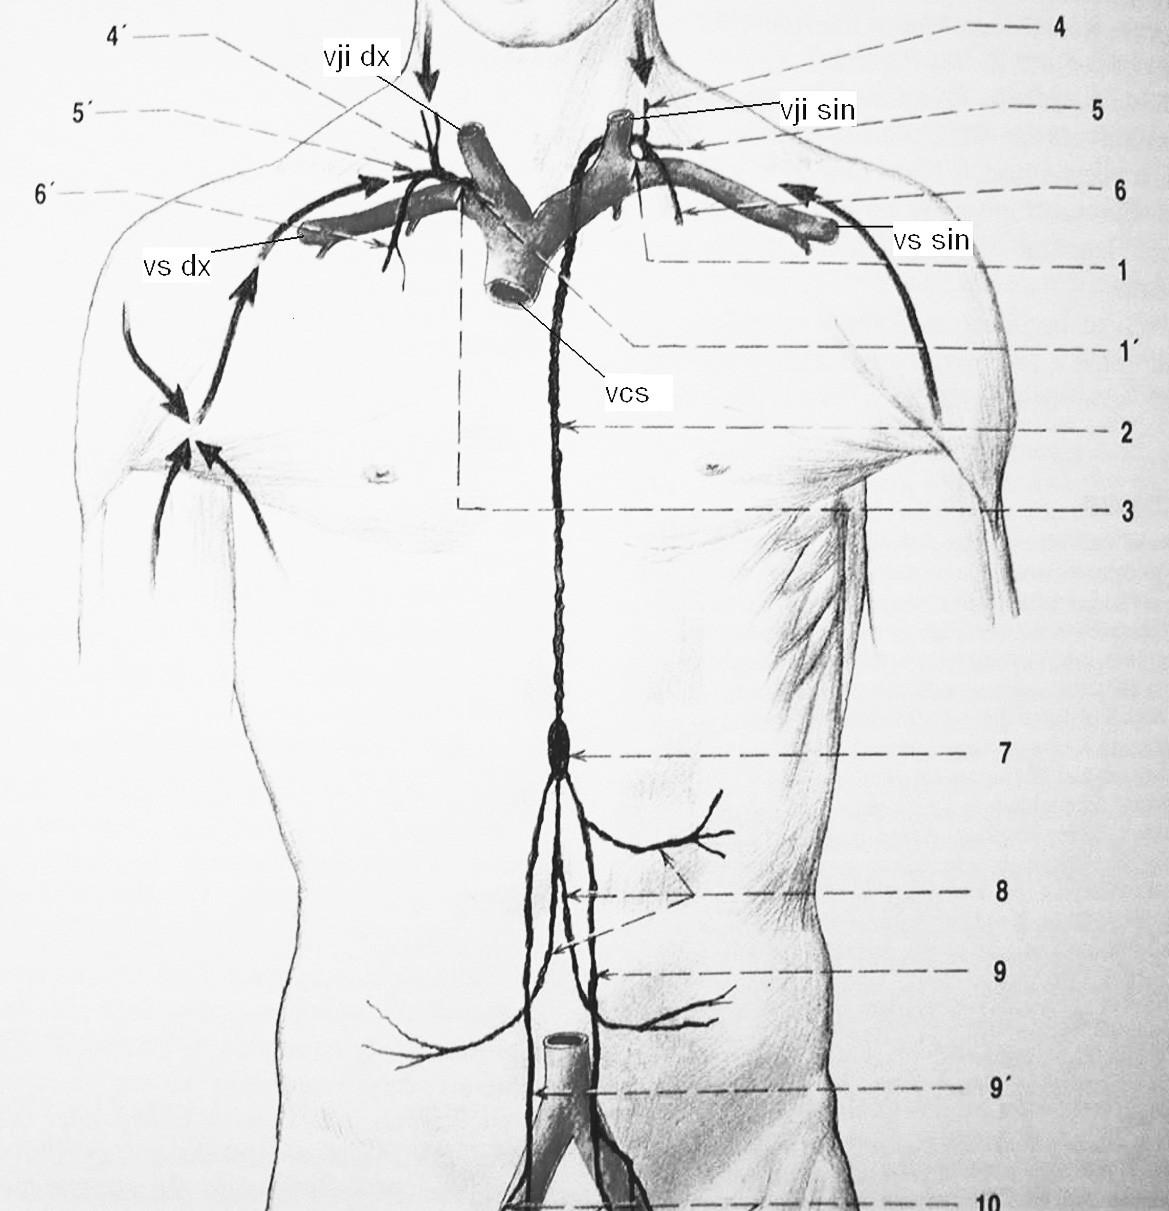 Lymfatický systém. vji dx – vena jugularis interna l.dx., vji sin – vena jugularis interna l.sin., vs dx – vena subclavia l.dx., vs sin – vena subclavia l.sin., vcs – vena cava superior, 1 angulus venosus sinister, 1' angulus venosus dexter, 2 ductus thoracicus, 3 ductus lymphaticus dexter, 4 truncus jugularis sinister, 4' truncus jugularis dexter, 5 truncus subclavius sinister, 5' truncus subclavius dexter, 6 truncus bronchomediastinalis sinister, 6' truncus bronchomediastinalis dexter